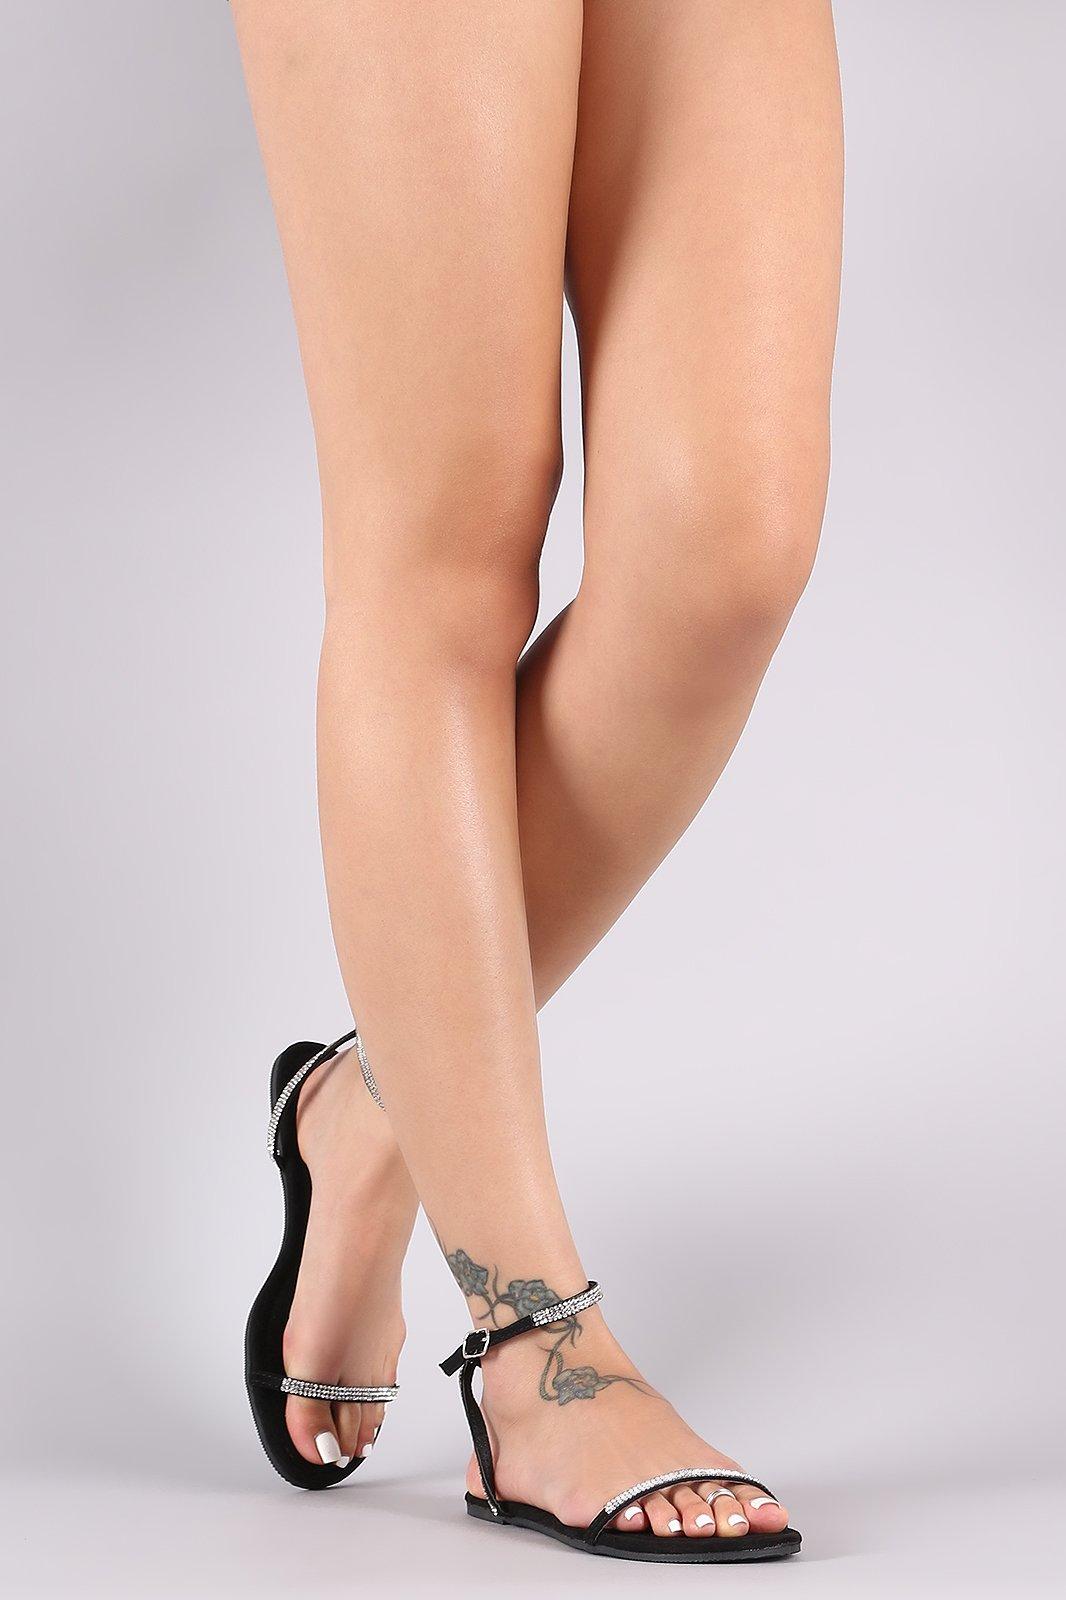 b6334a3db Liliana Rhinestone Ankle Strap Flat Sandal on Storenvy